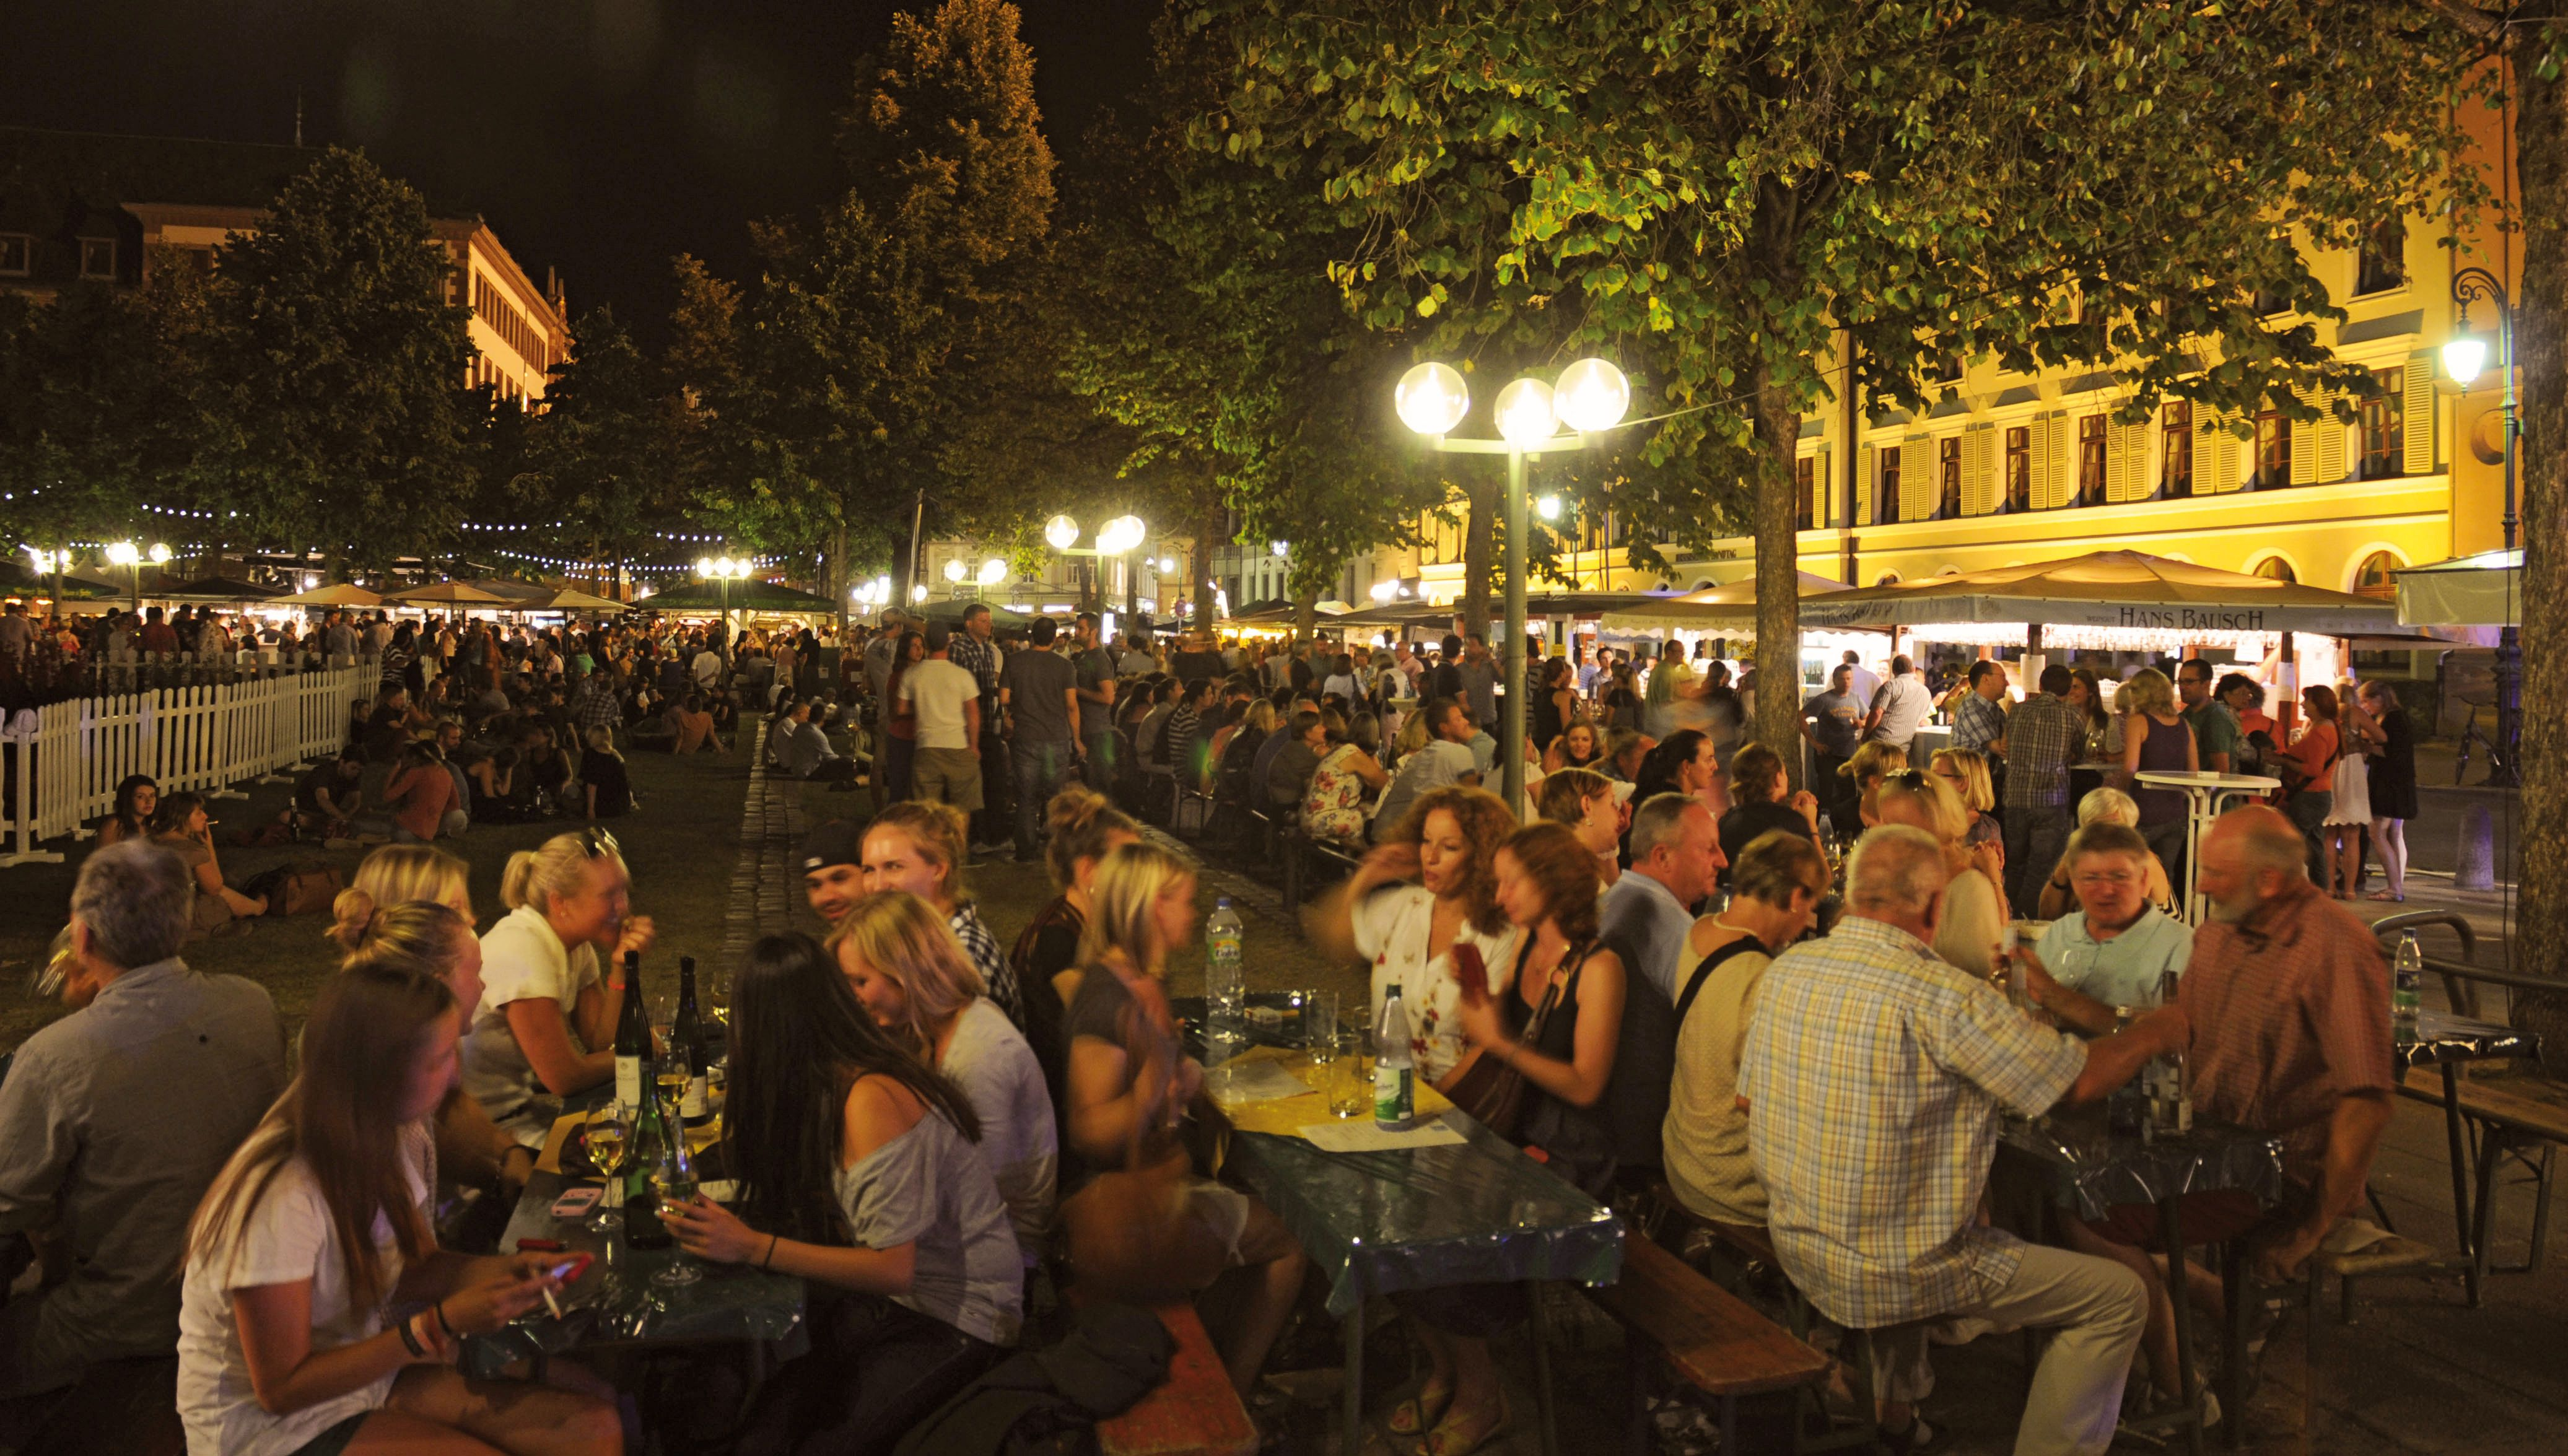 Weinfest Wiesbaden Podroze